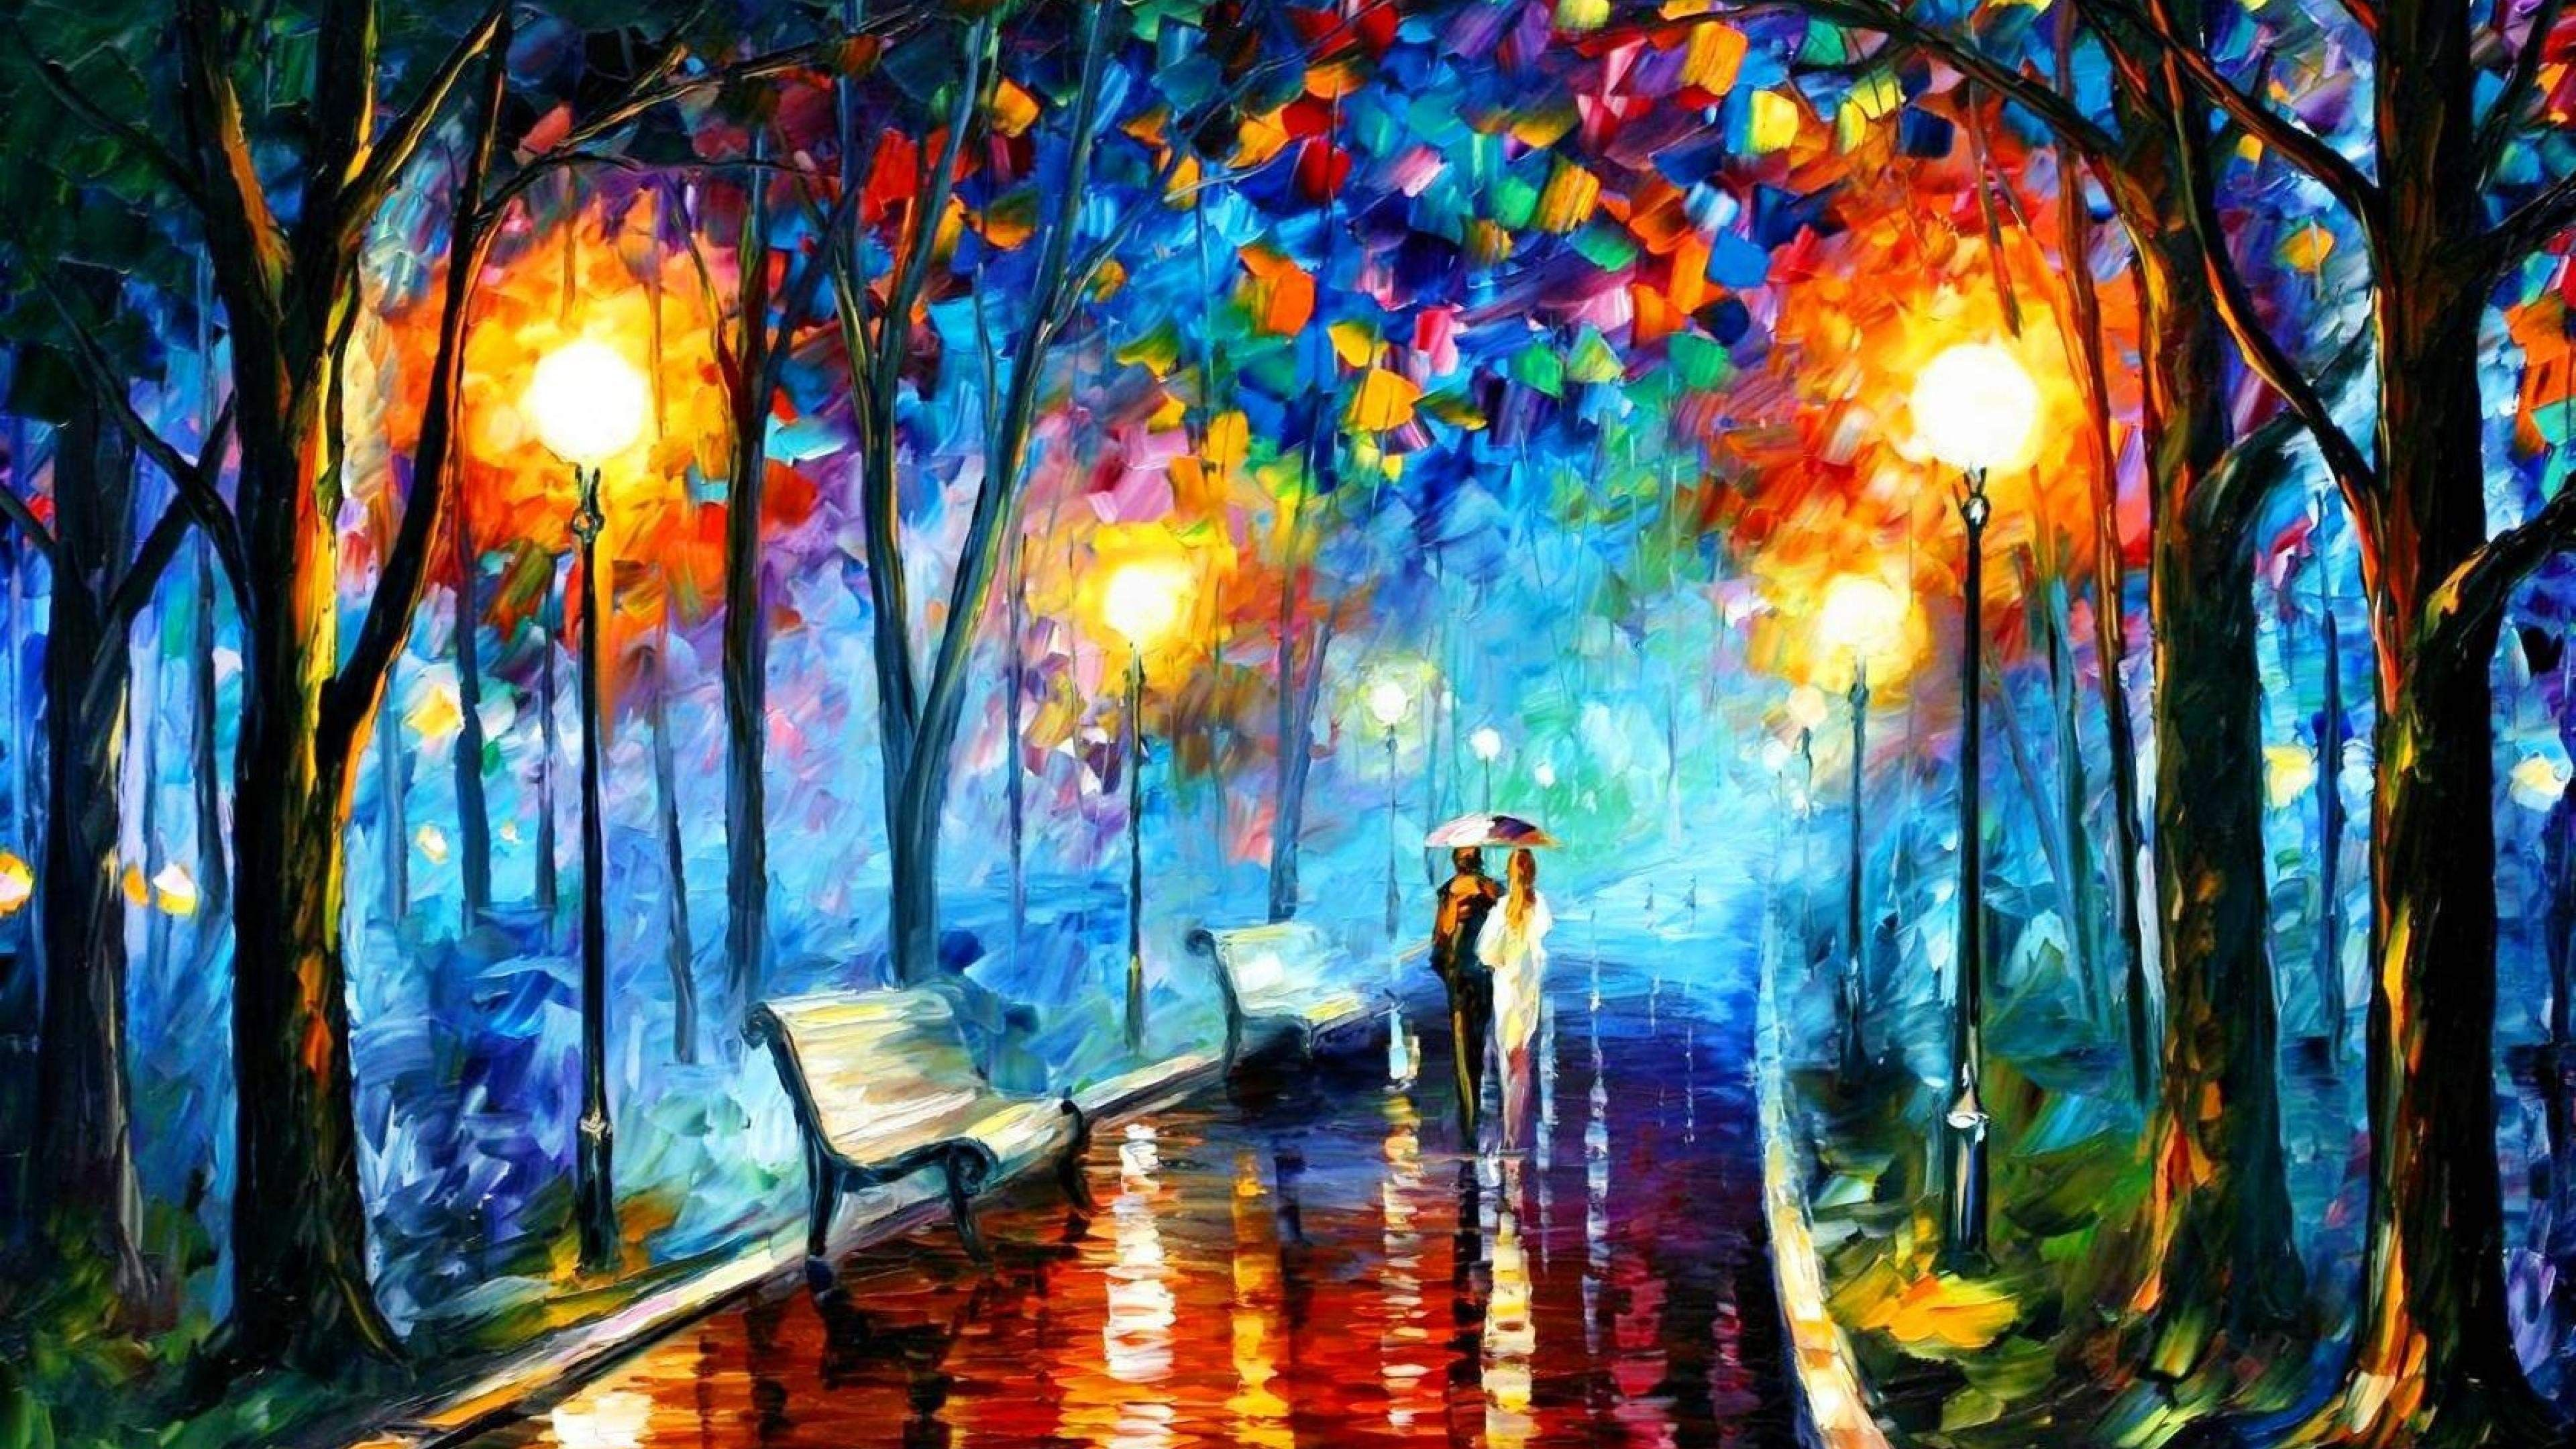 couple painting art 4k ultra hd wallpaper ololoshenka in